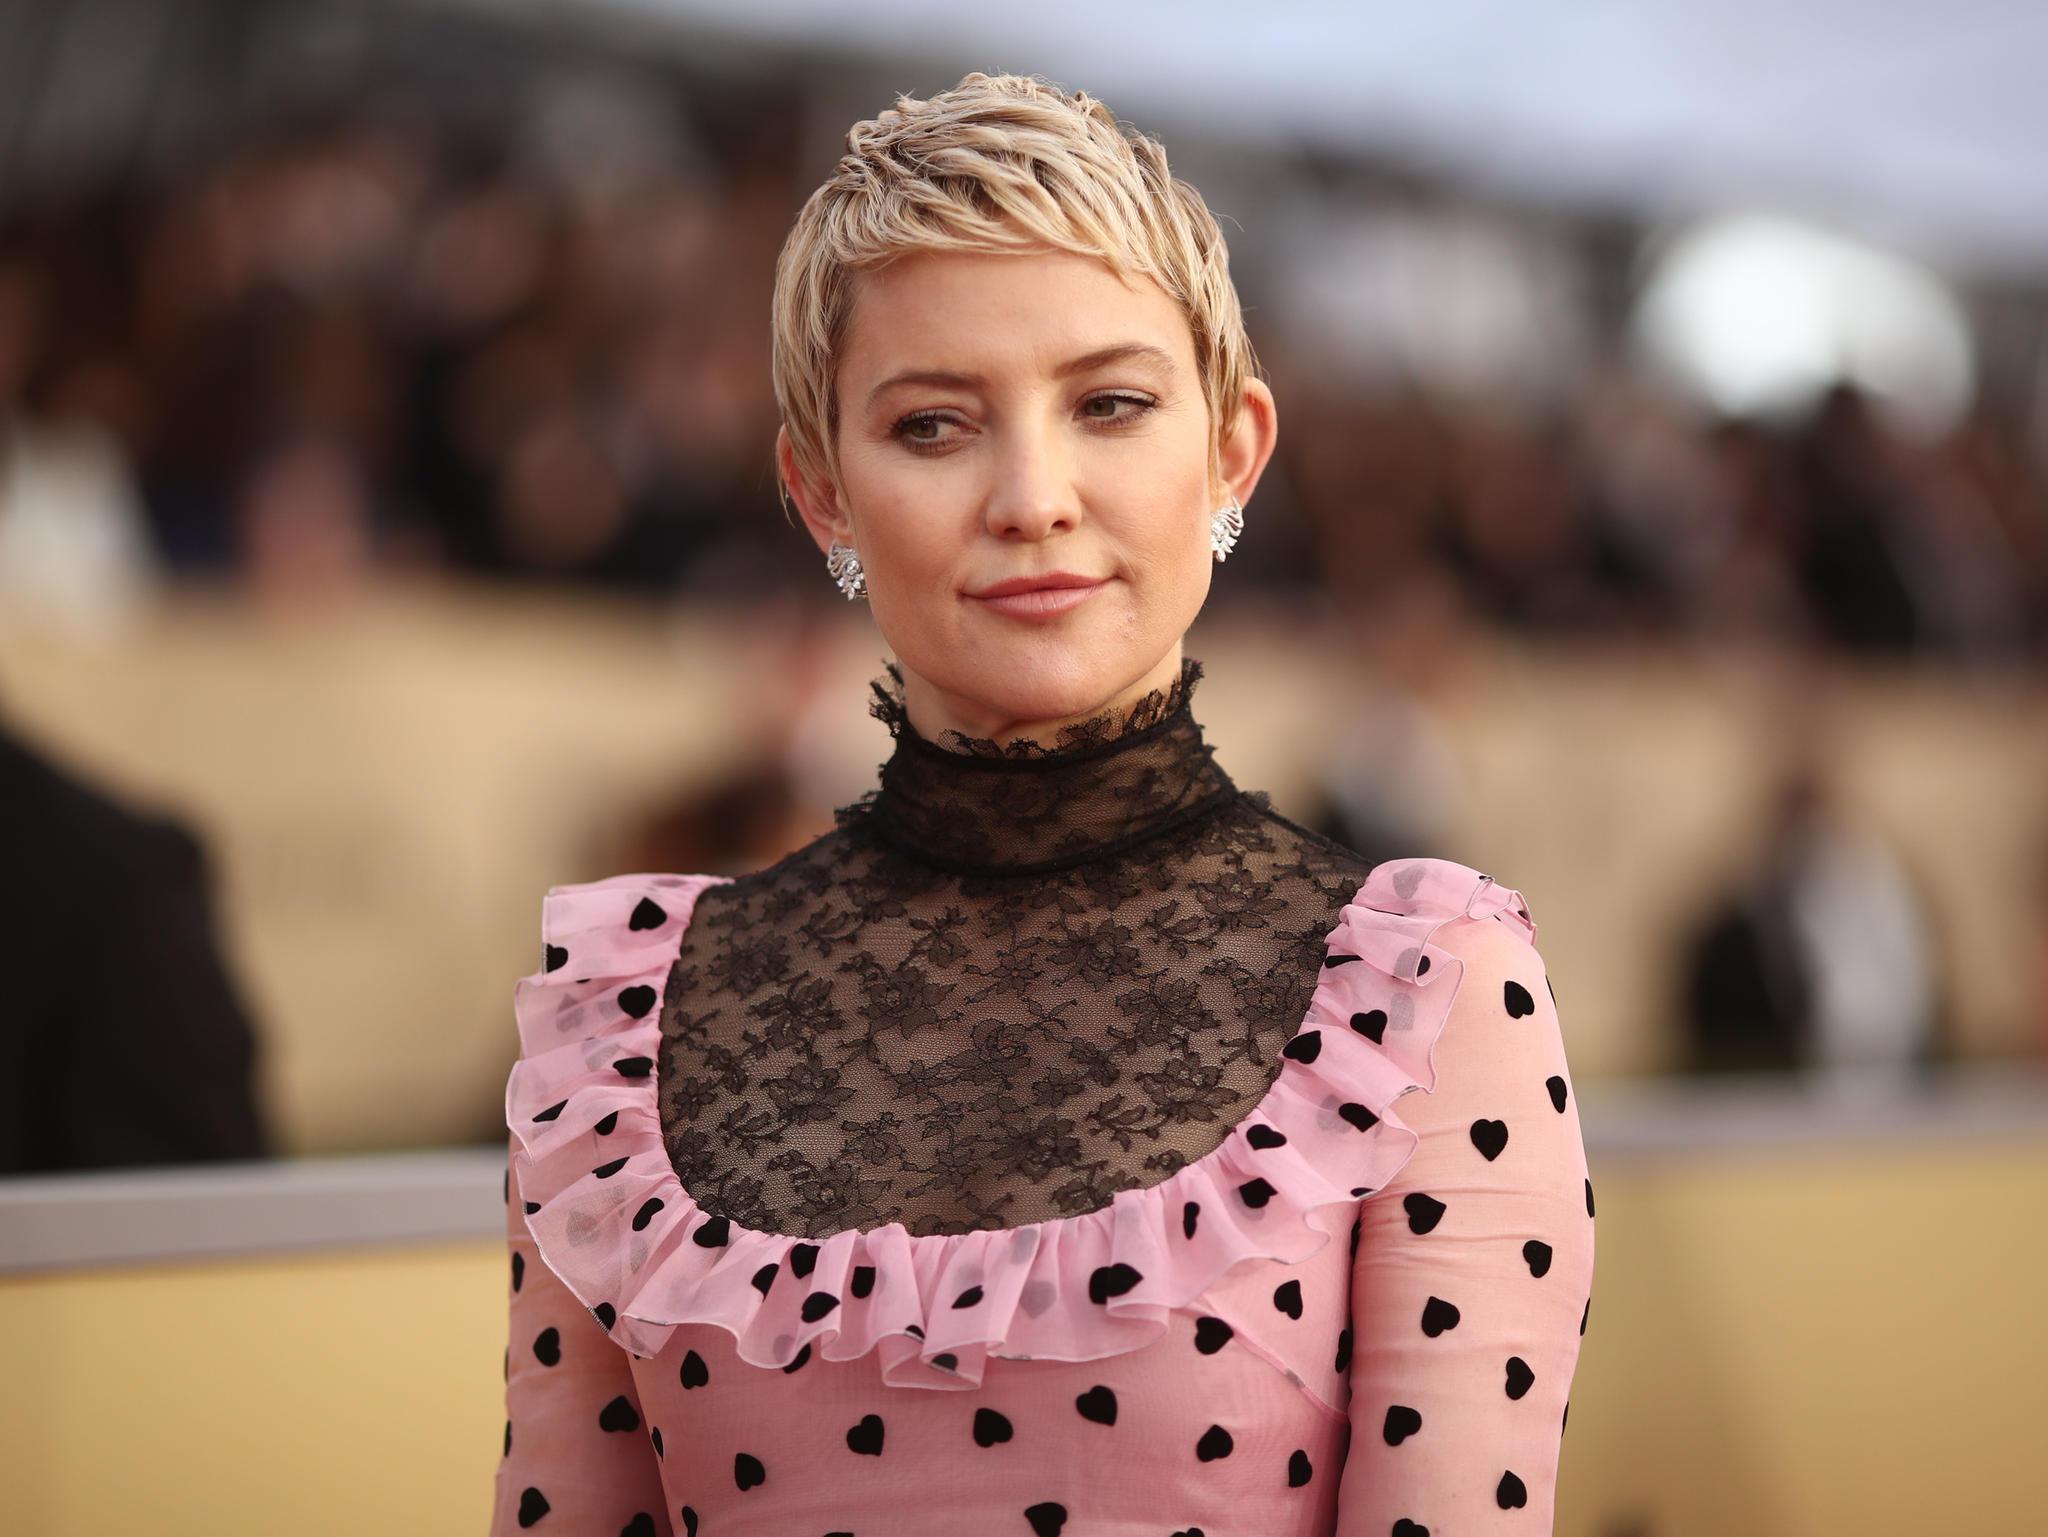 Promis mit Kurzhaarfrisuren: Kate Hudson mit Pixie Cut